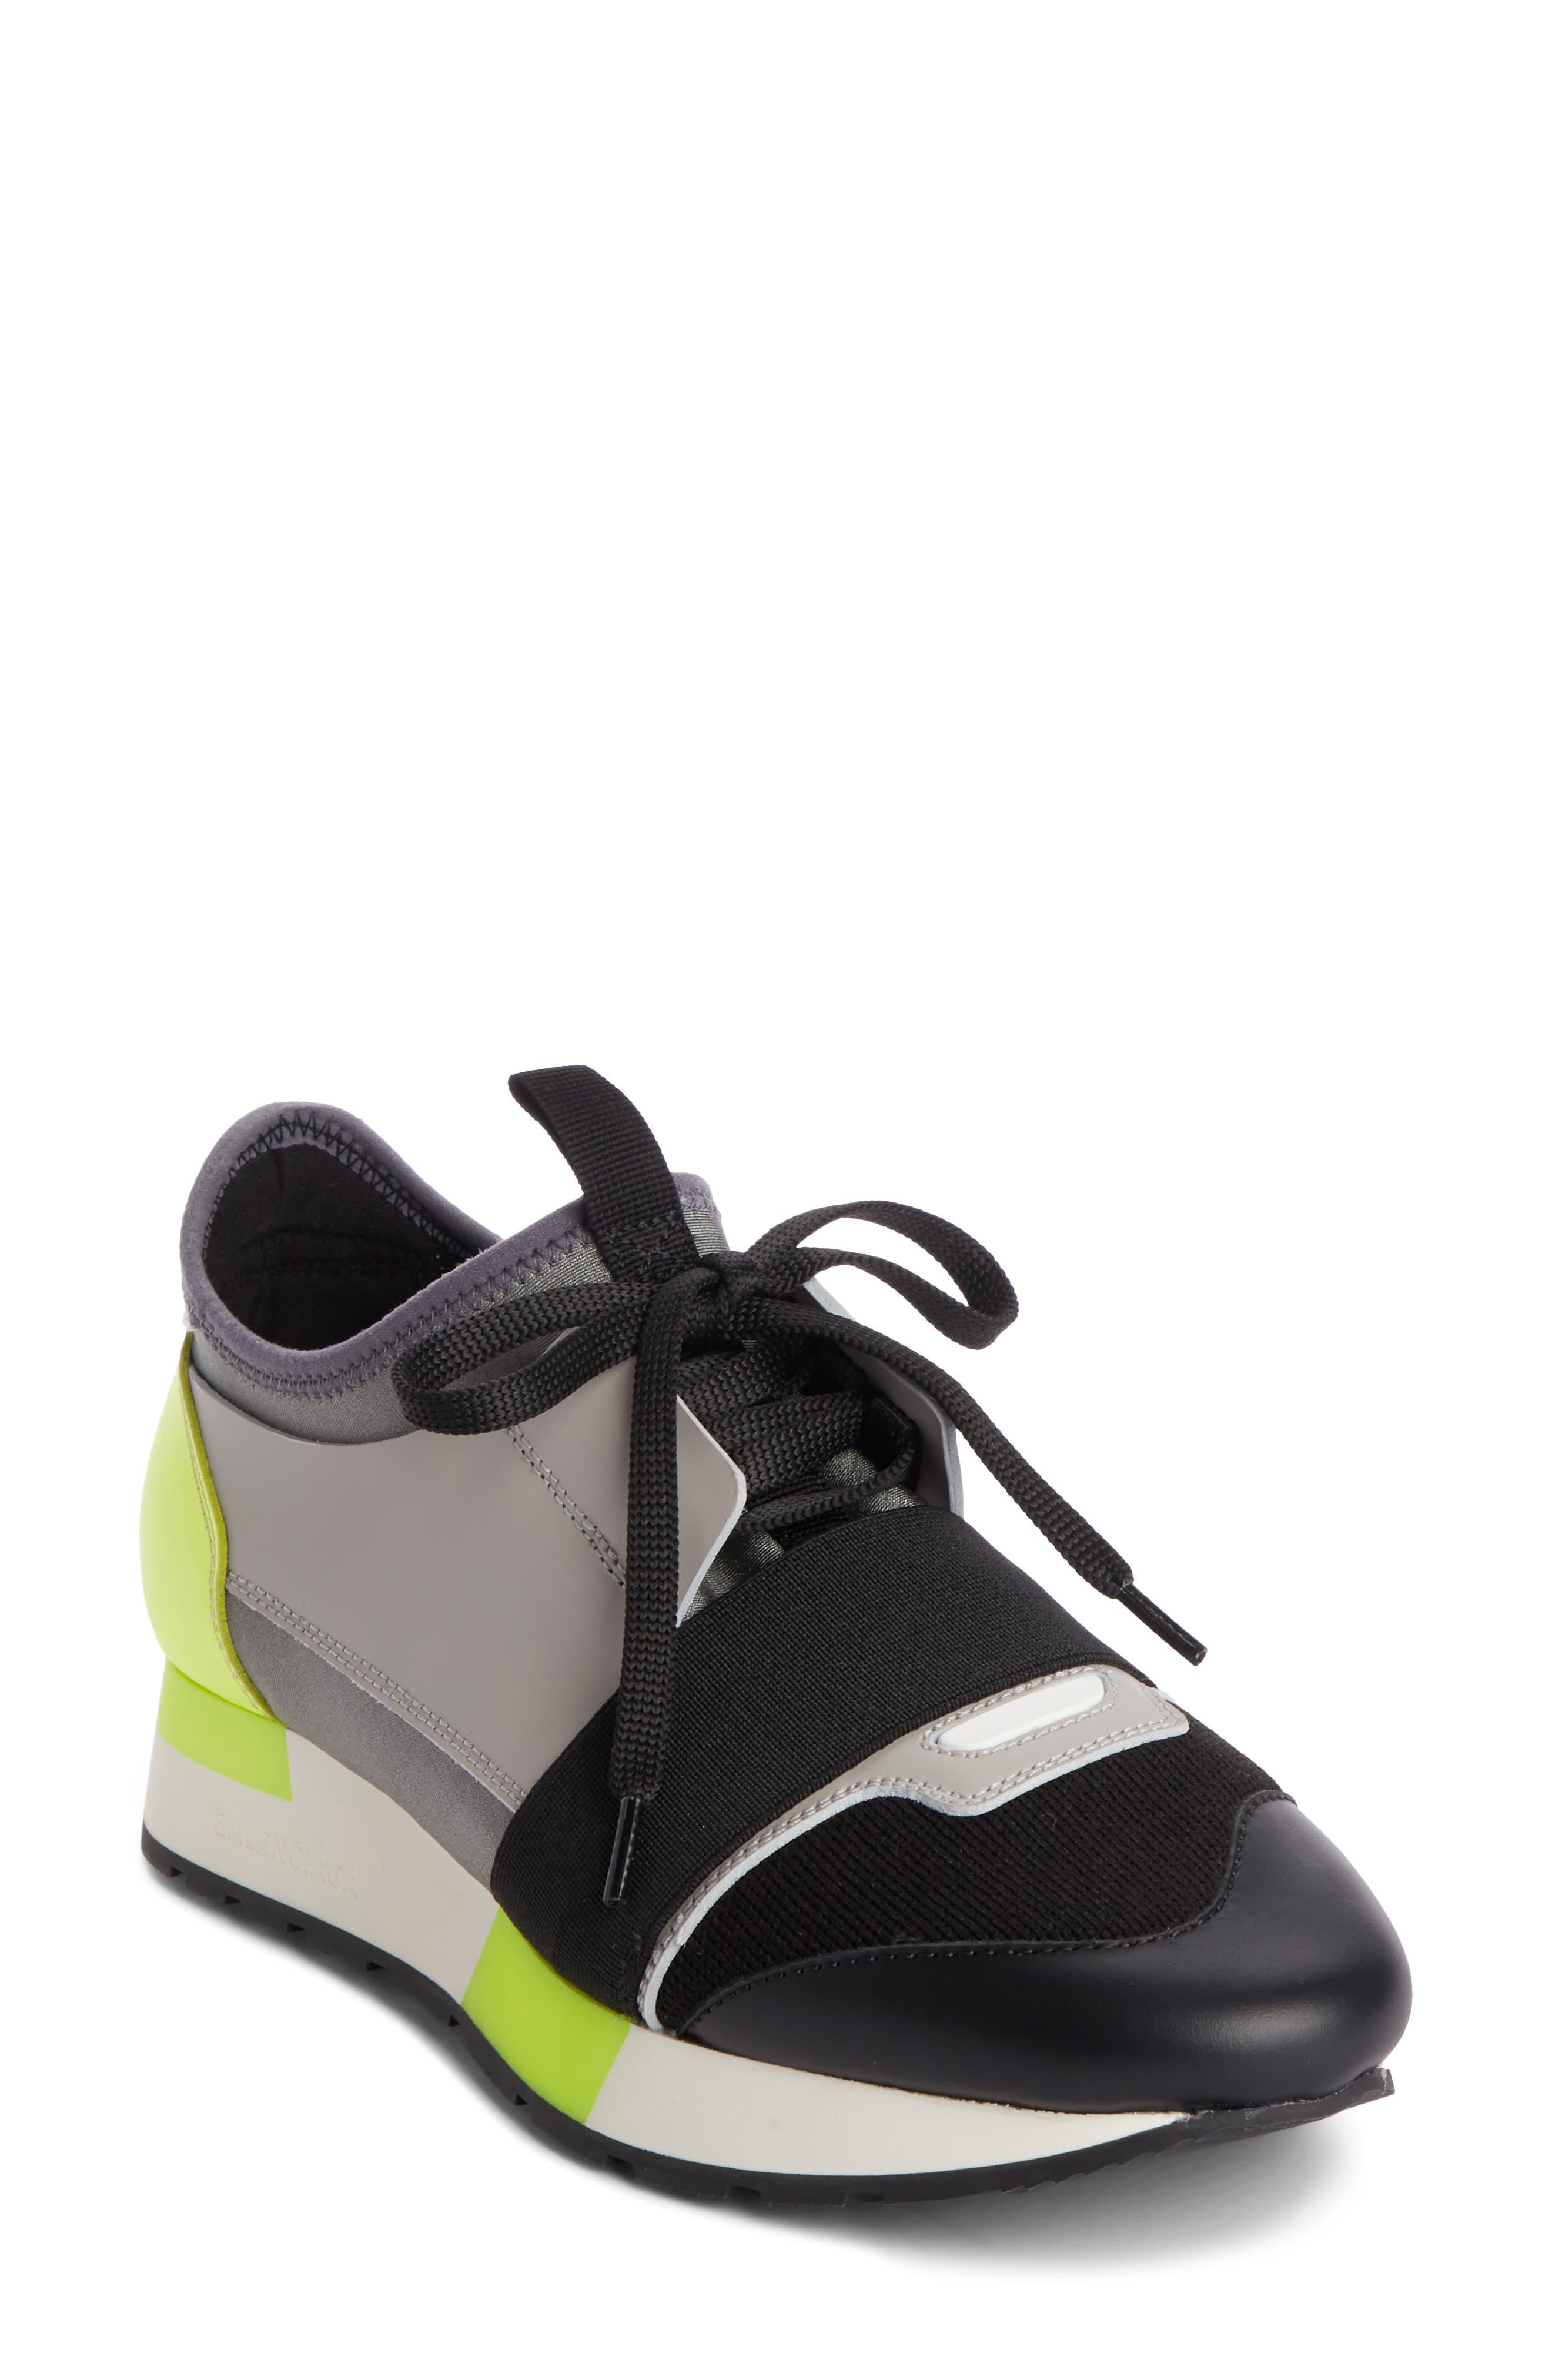 Lace-Up Sneaker,                             Main thumbnail 1, color,                             BLACK/ GREY/ YELLOW